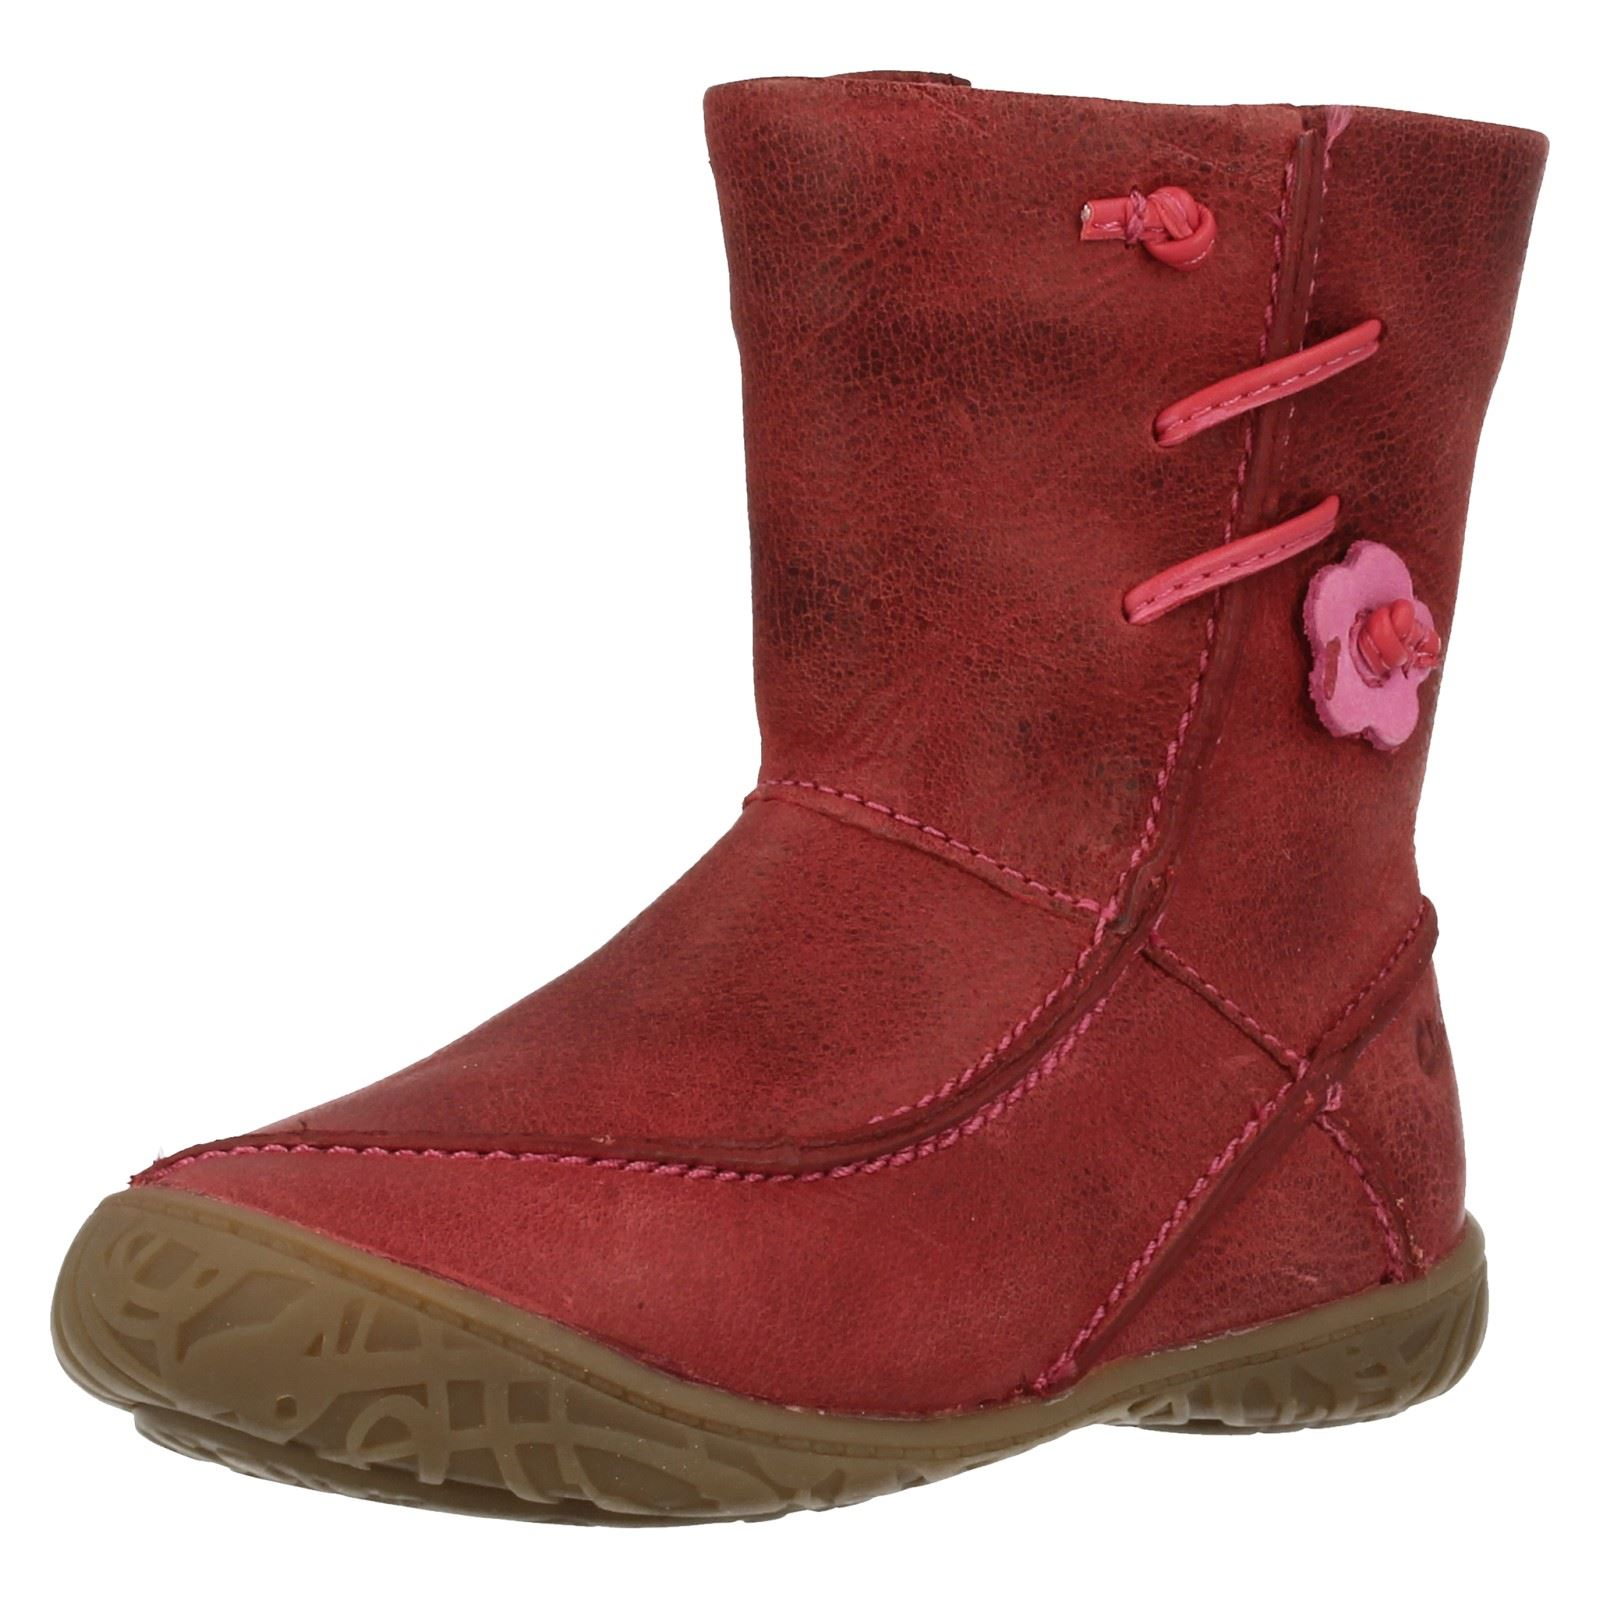 Girls Clarks Boots /'Hoola Star/'